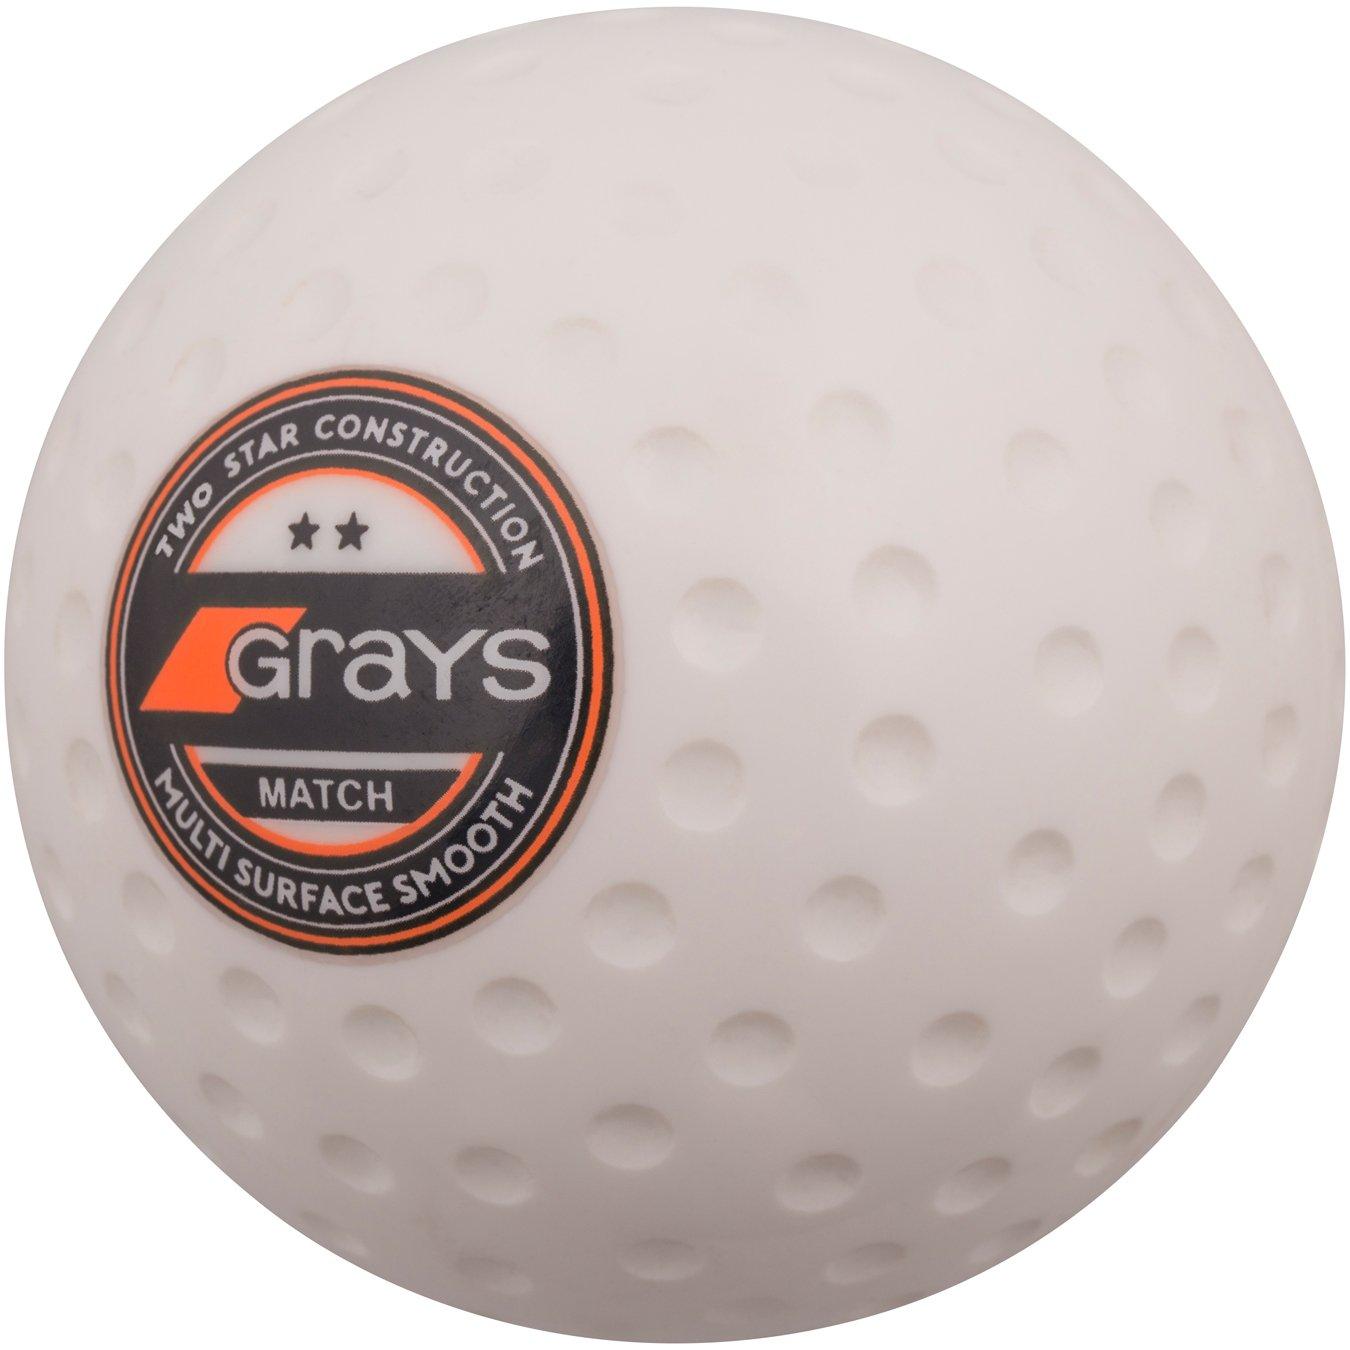 Grays International Match hockey Ball 24644501 3917.43903